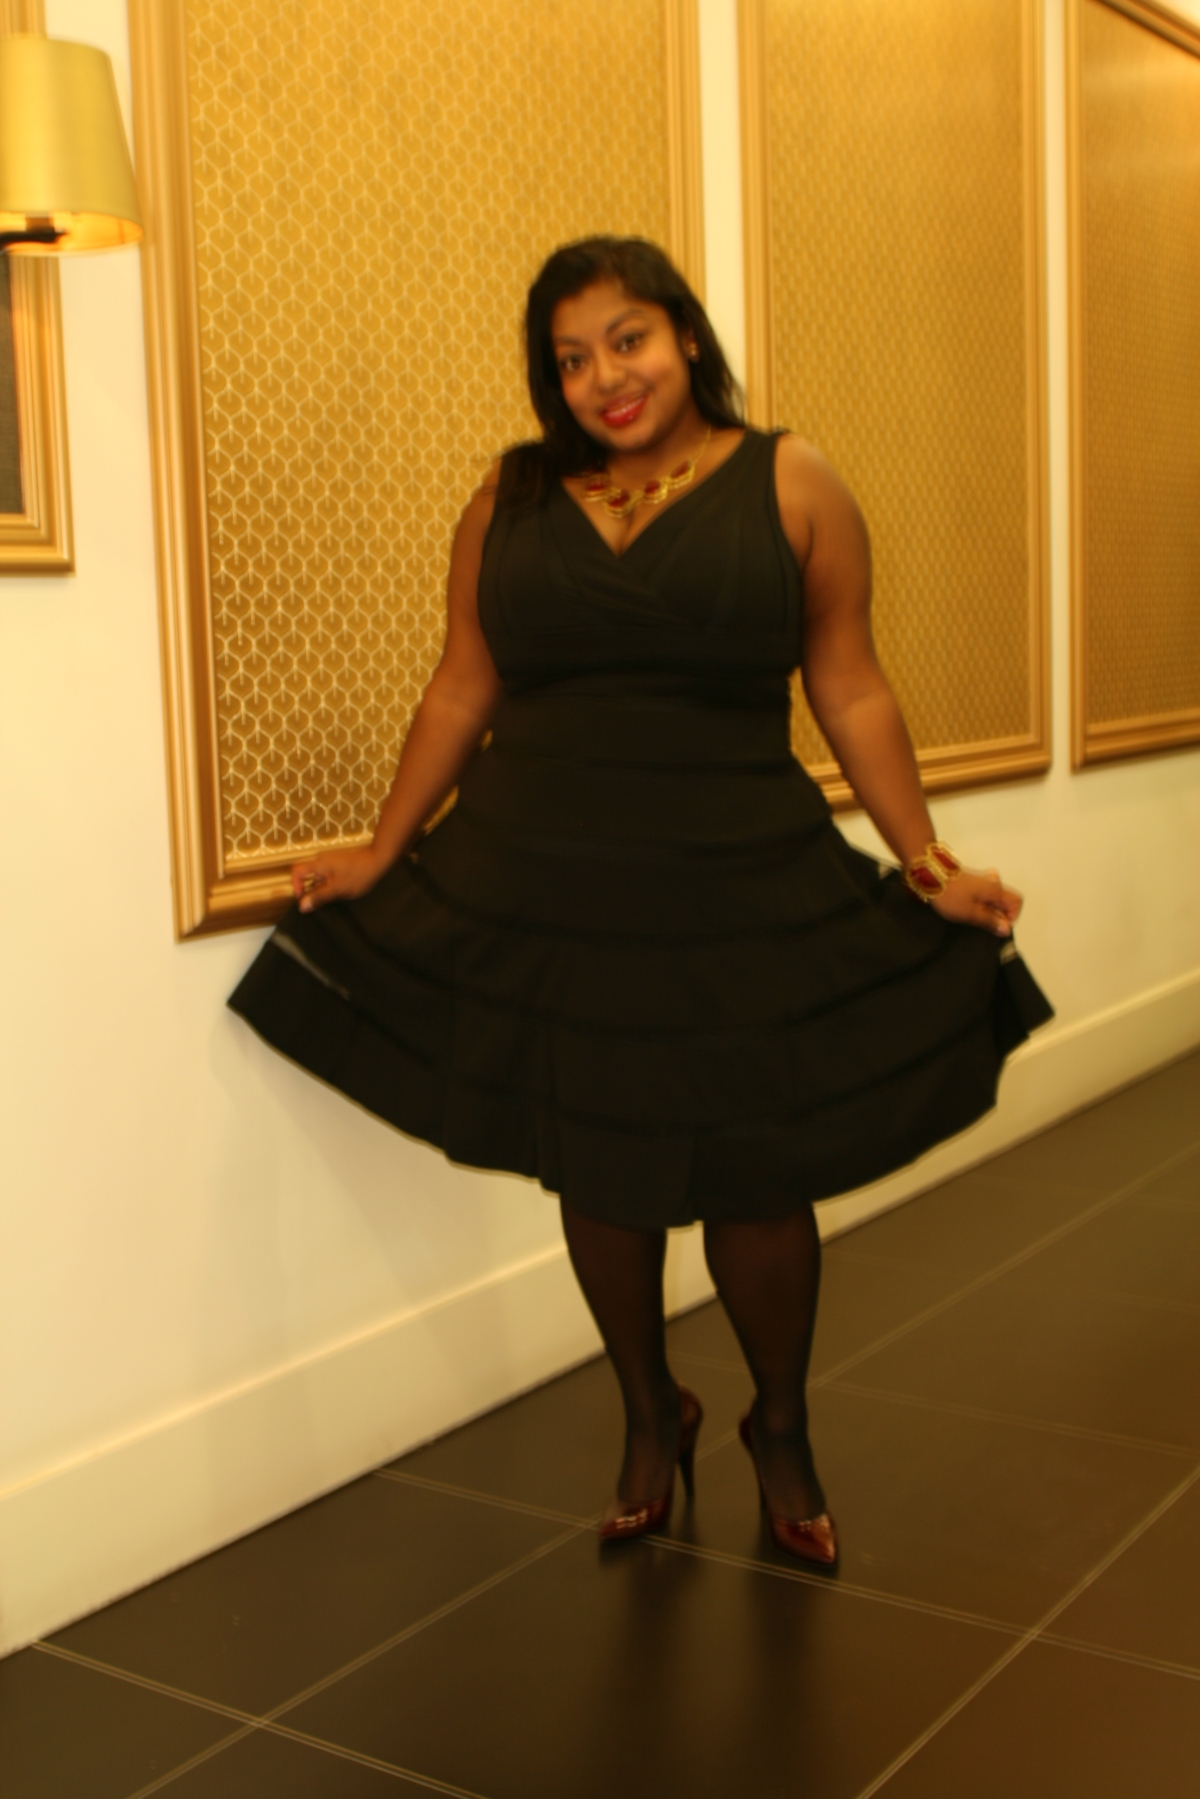 Little Black Dress#4